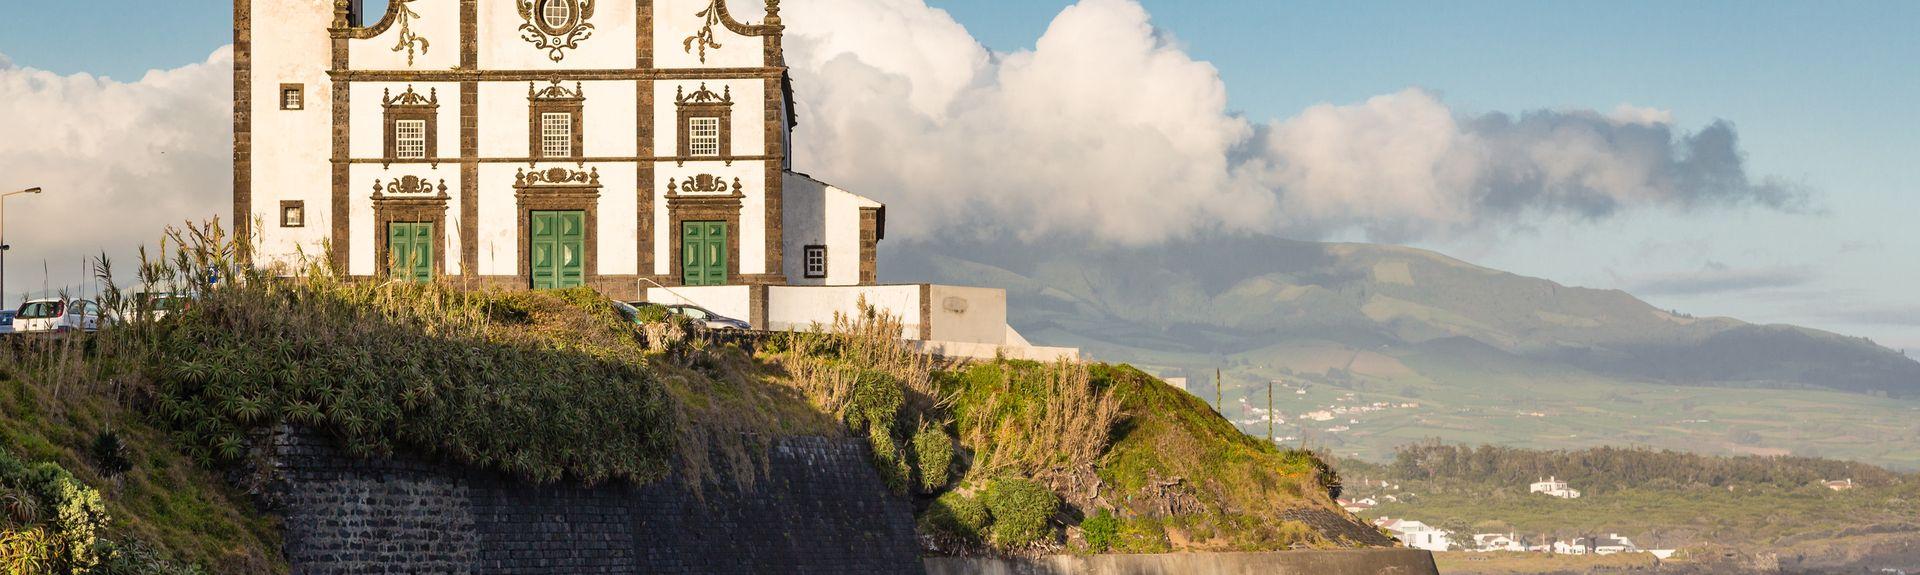 São Miguel, Portugal